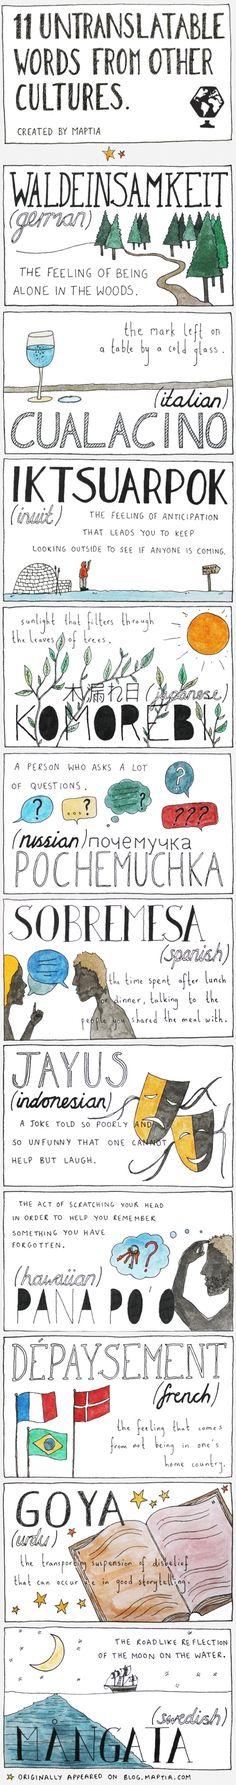 Palabras únicas en diferentes idiomas.